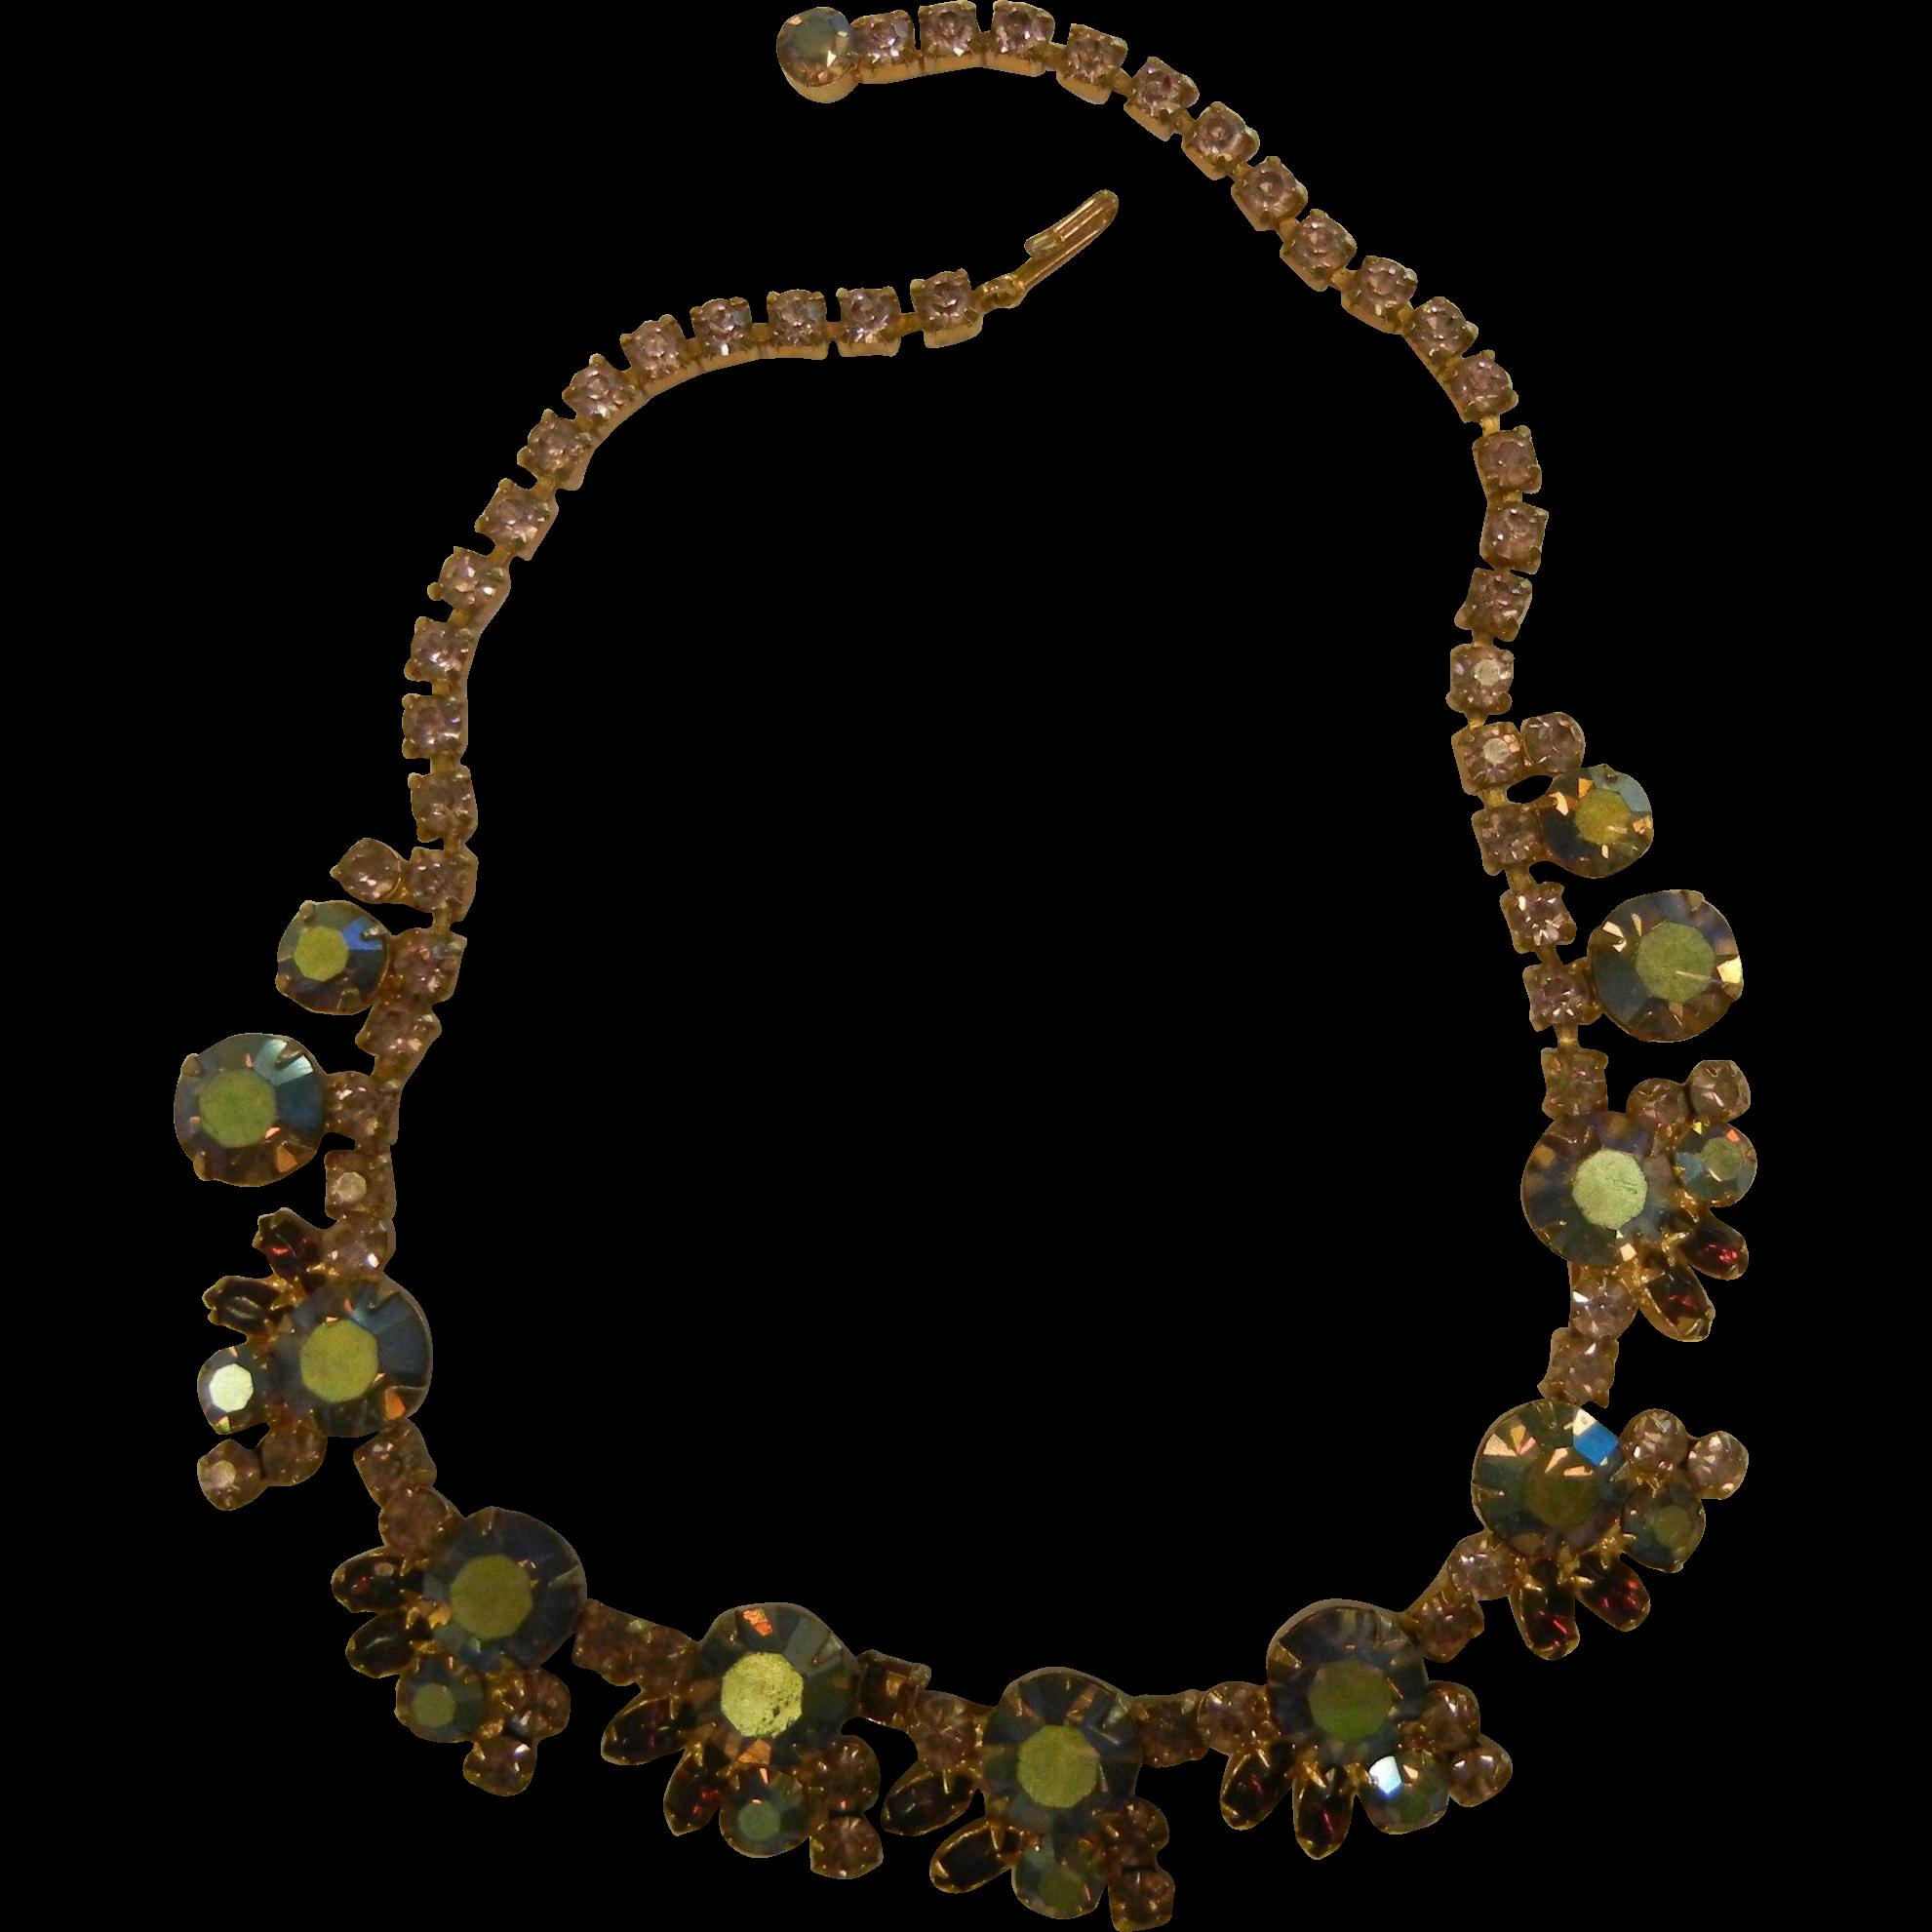 Vintage Costume Jewelry Choker Necklace w/ Iridescent Rhinestones